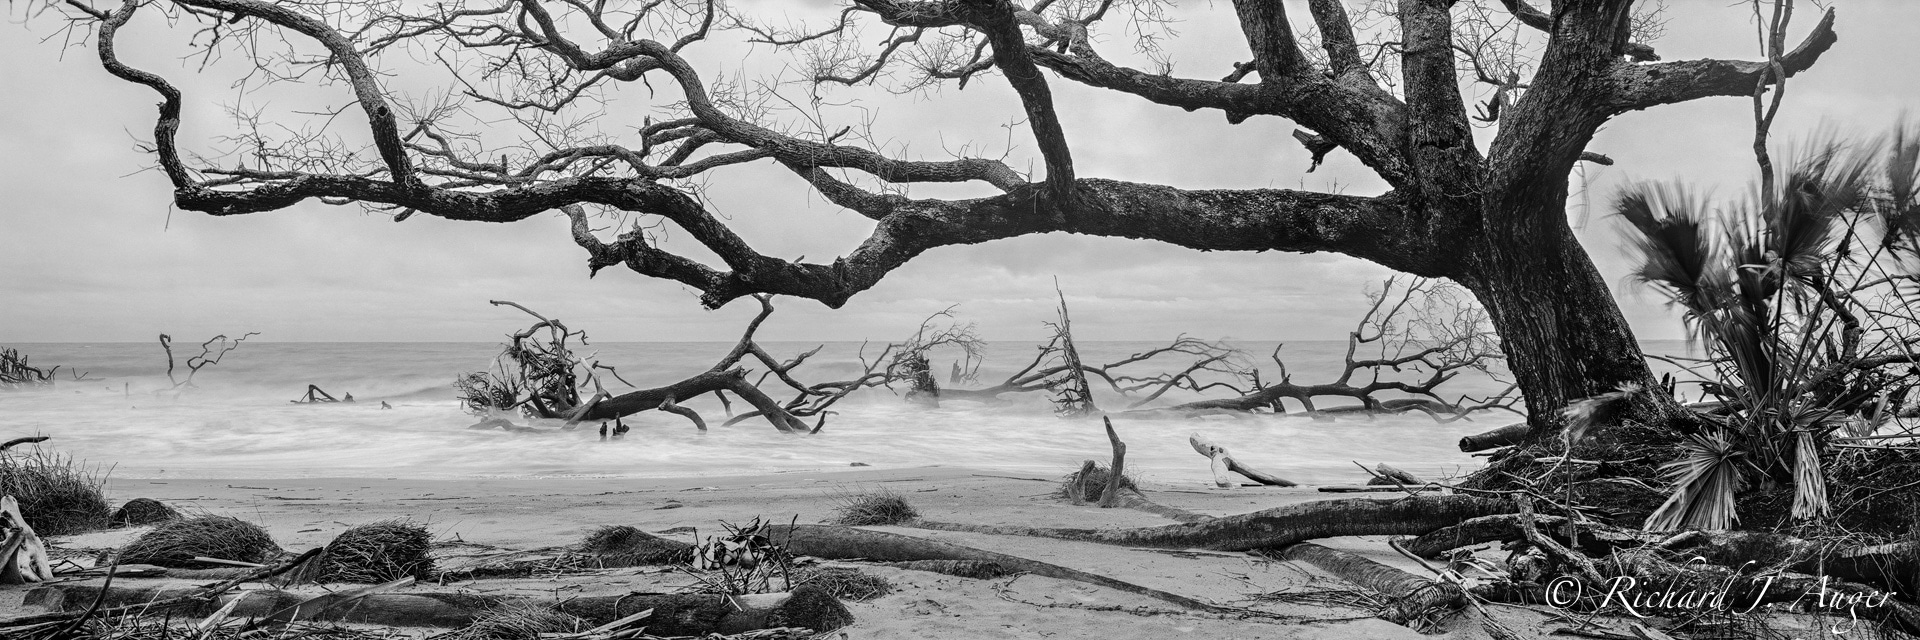 Hunting Island, South Carolina, driftwood, winter, beach, fog, long exposure, photograph, landscape, black and white, panorama